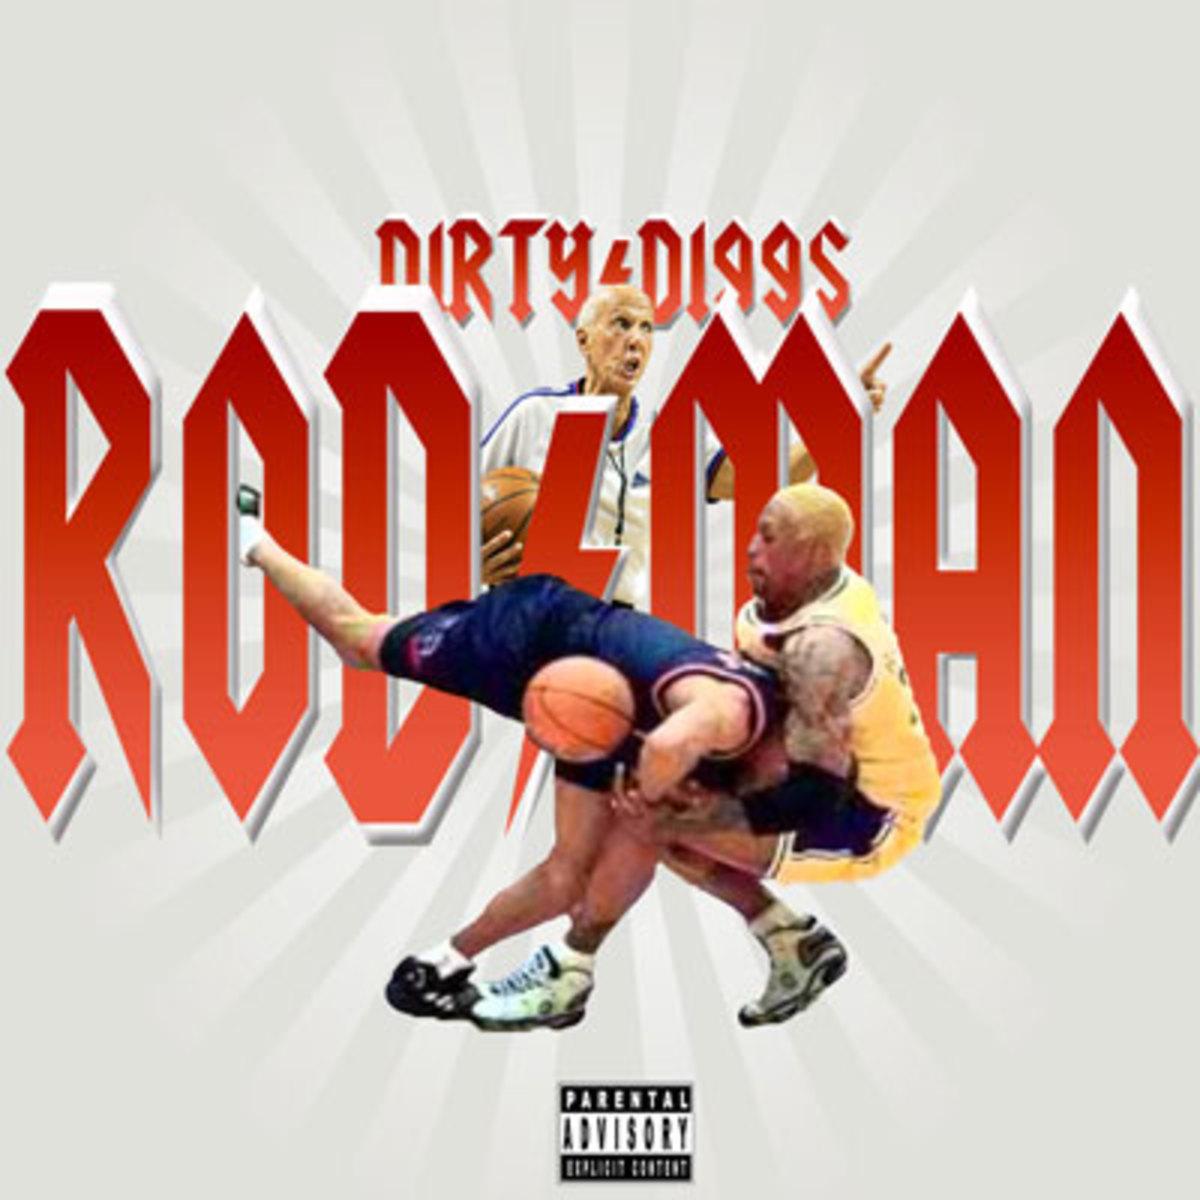 dirtydiggs-rodman.jpg